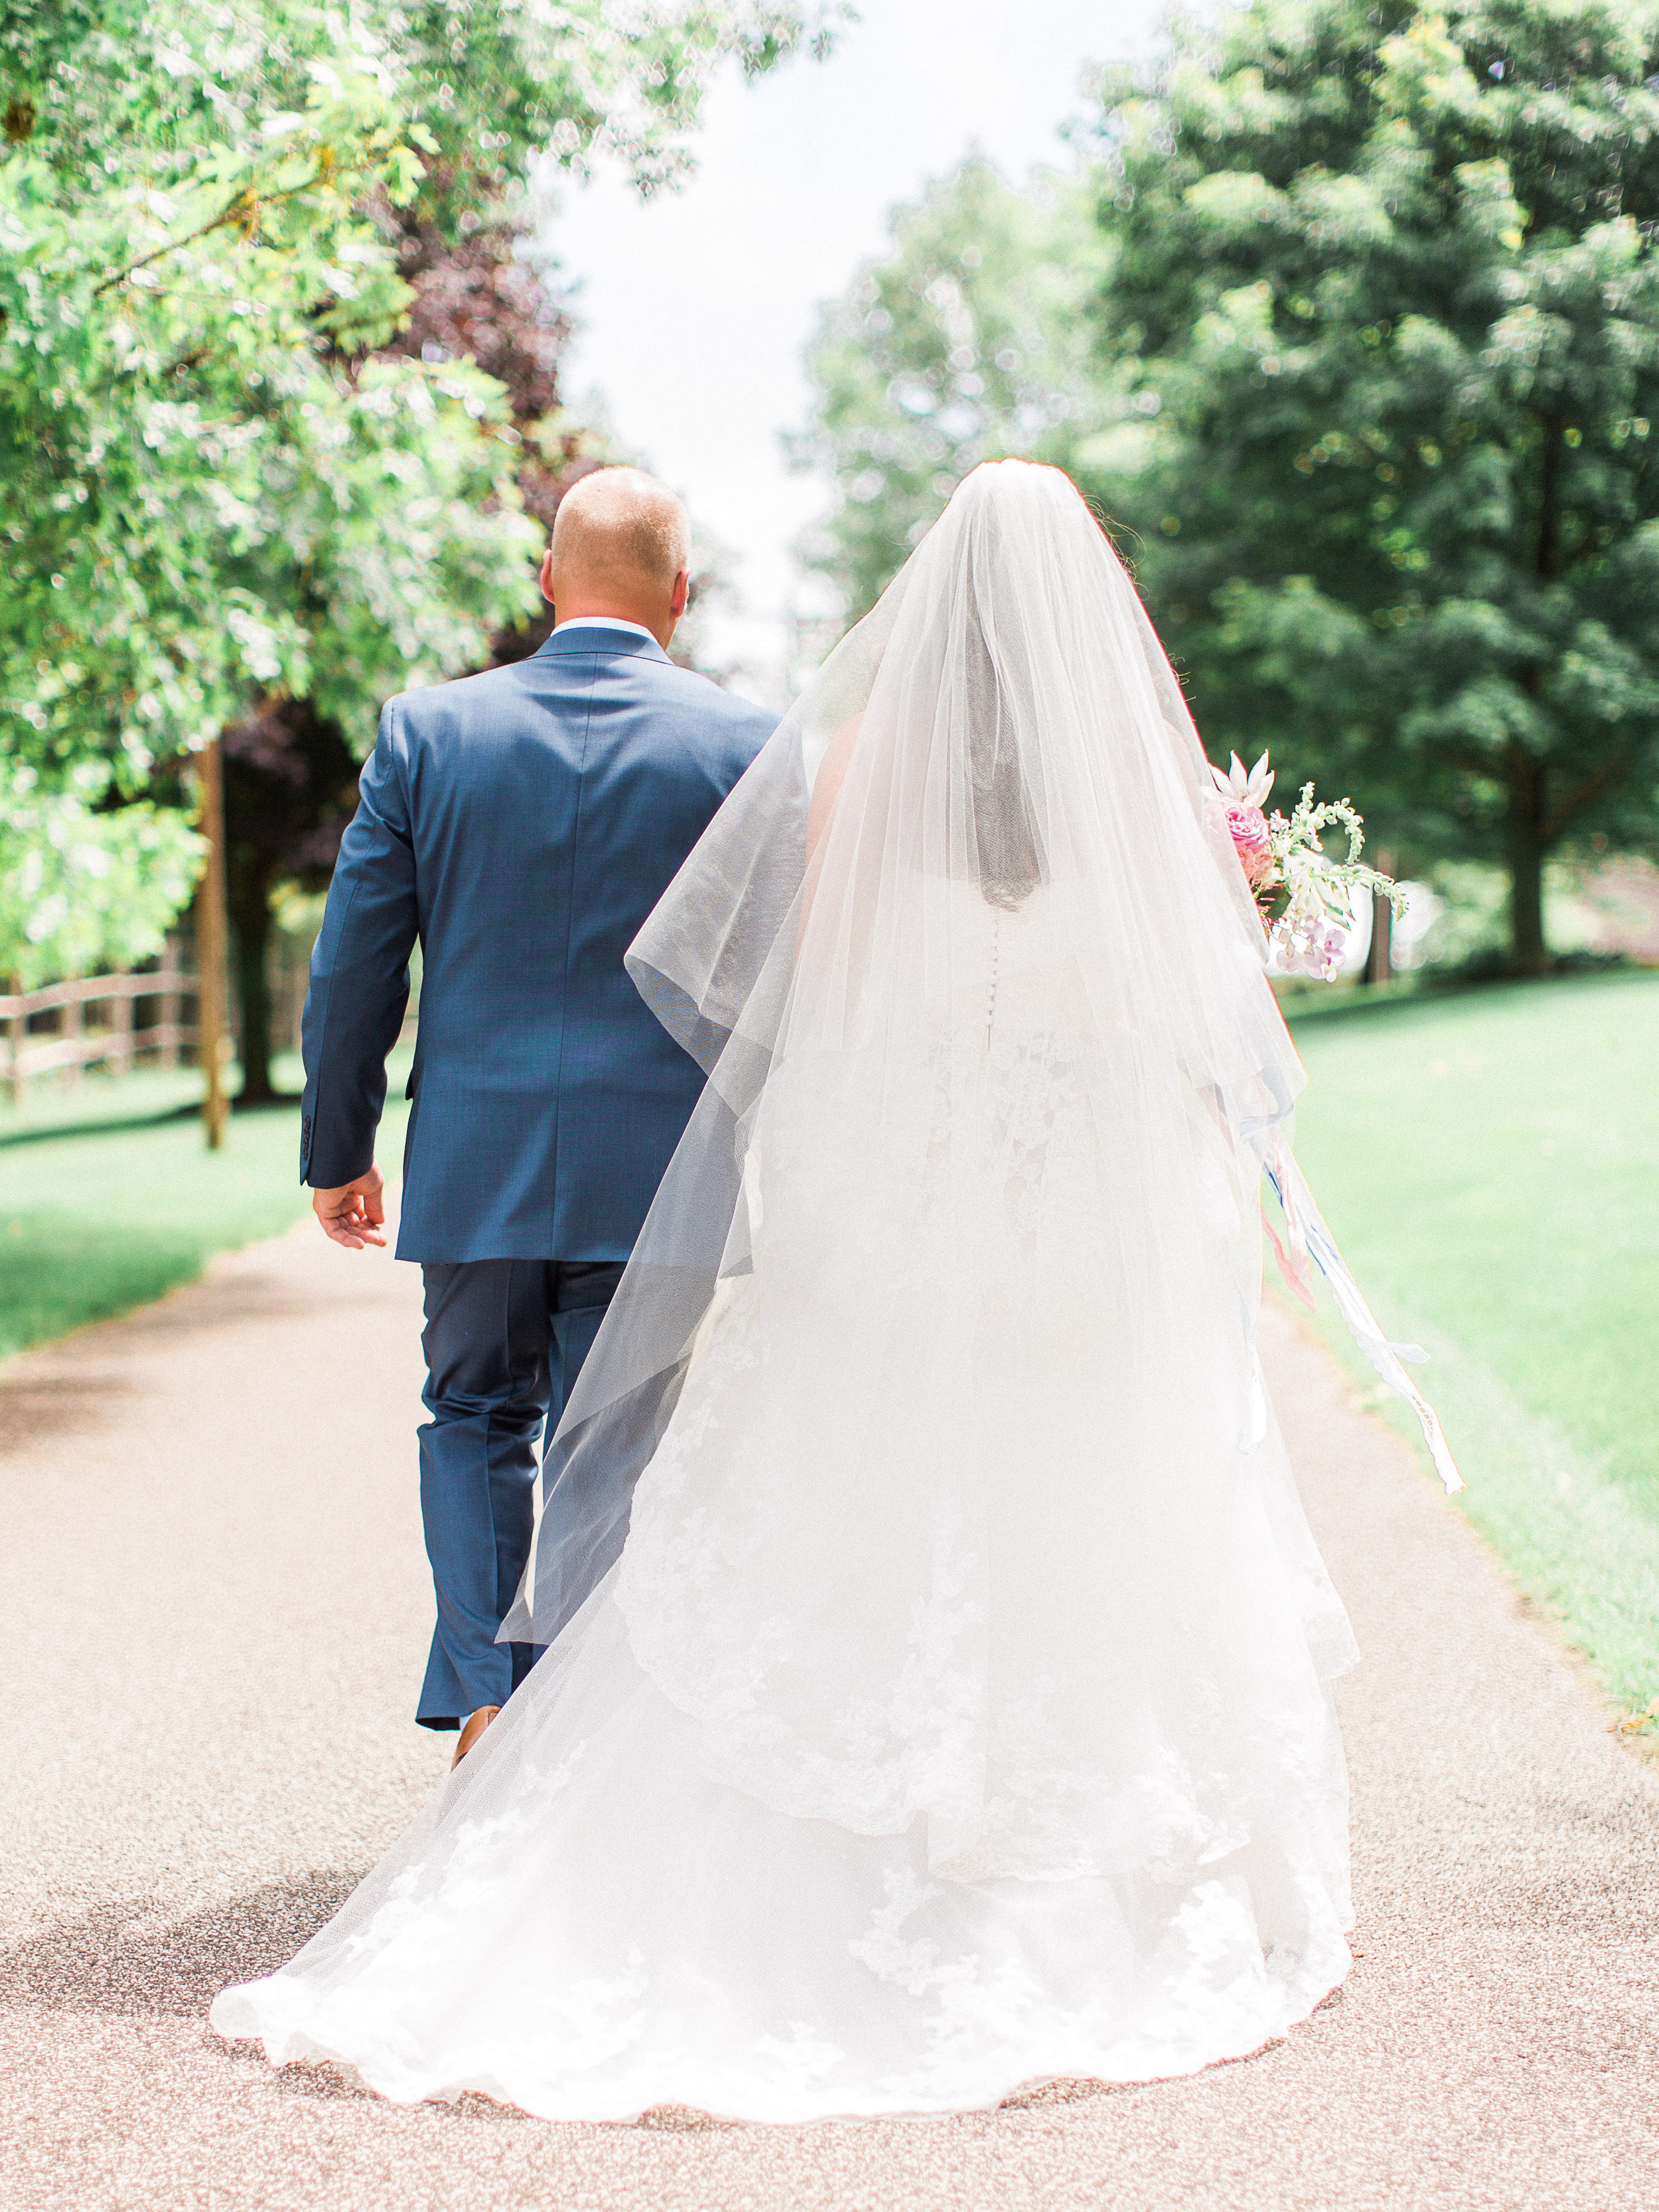 ERIC AND HALLIE WEDDING-HI RESOLUTION FOR PRINTING-0270.jpg